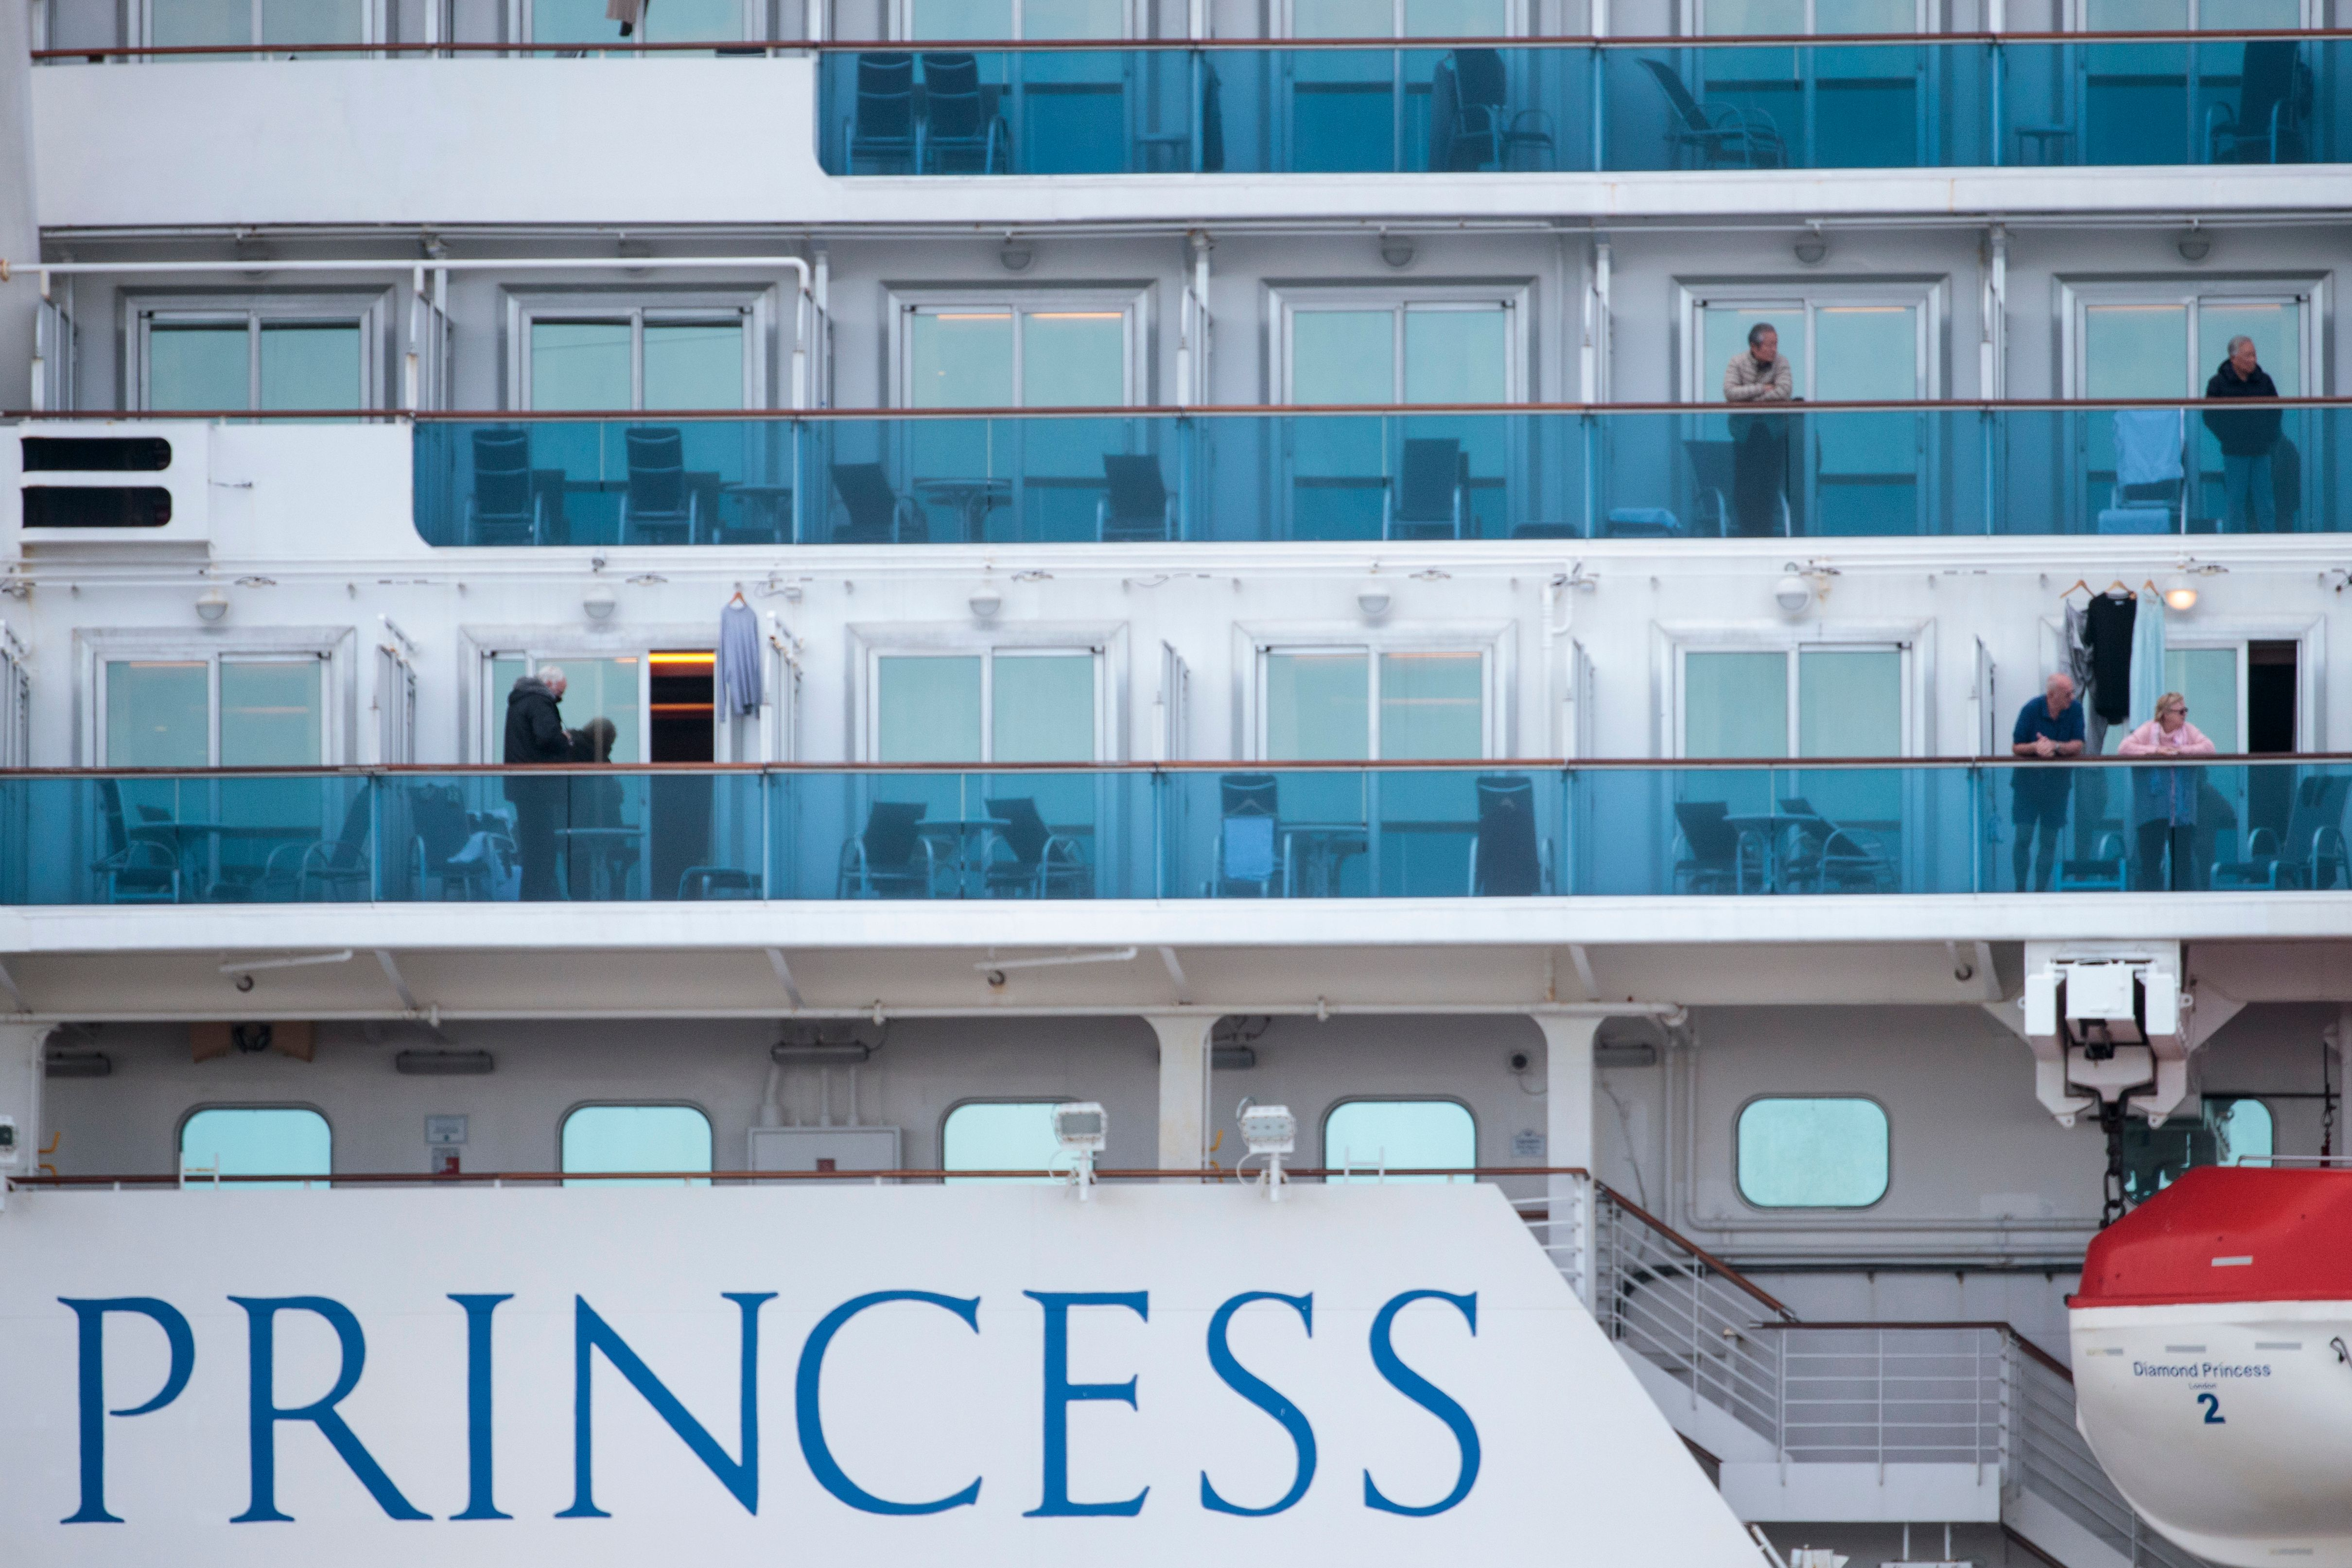 Passengers wearing face masks on the Diamond Princess cruise ship, docked in Yokohama, Japan on February 12, 2020.